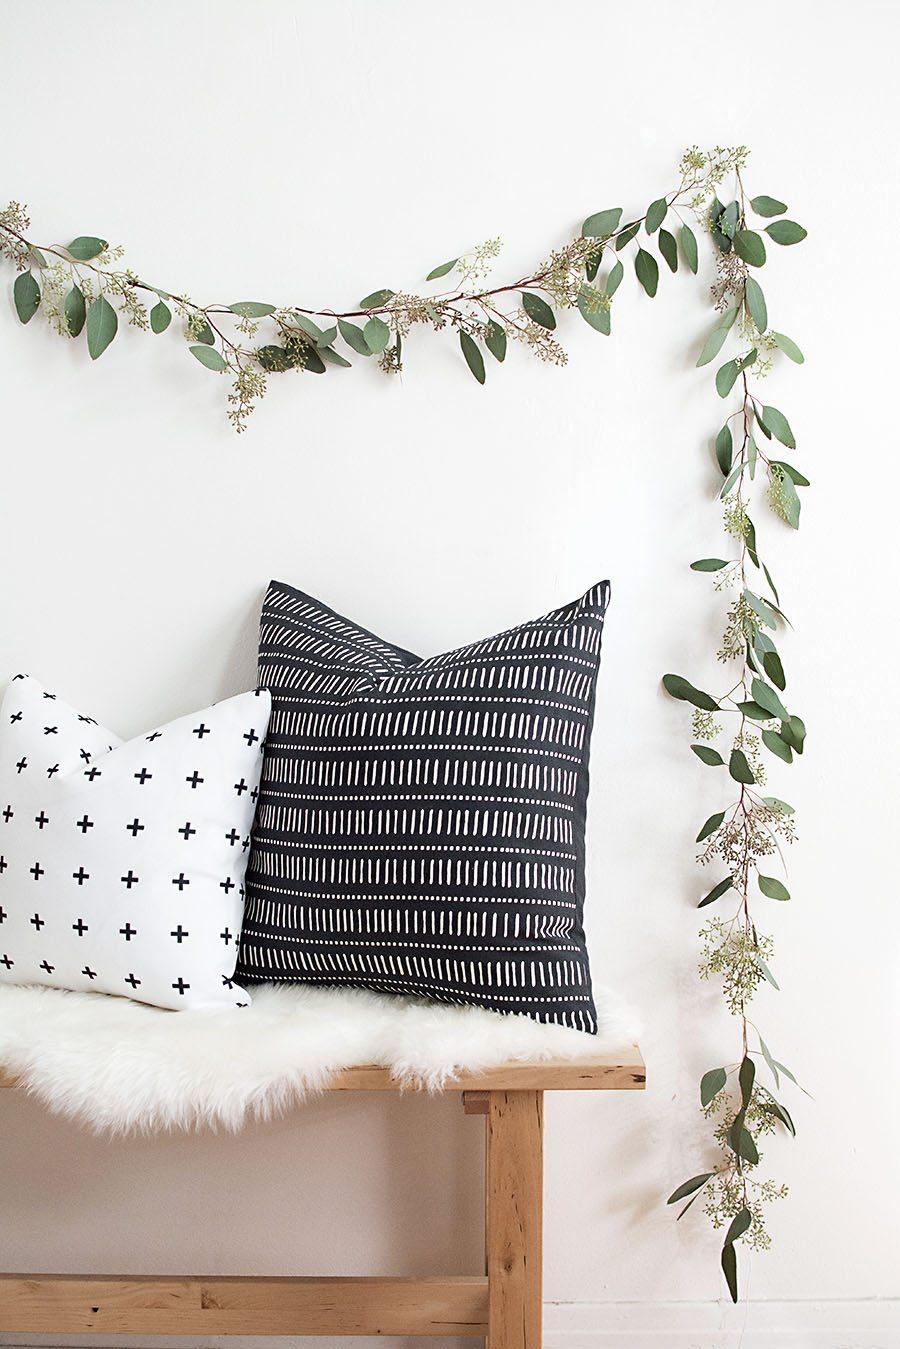 Eucalyptus kerstdecoratie